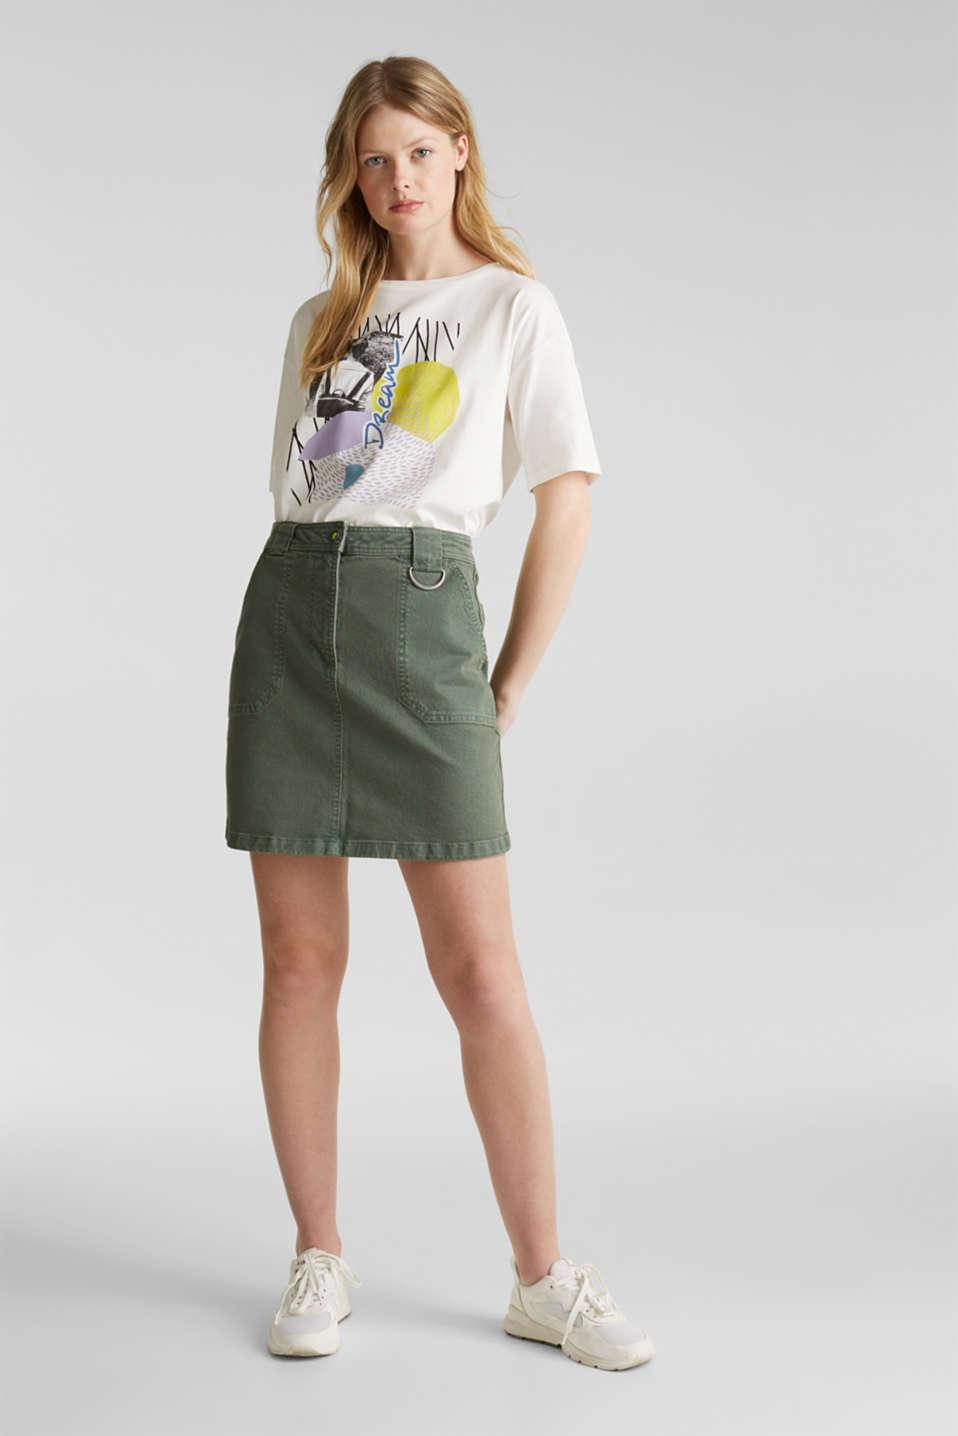 Denim skirt with pockets, KHAKI GREEN, detail image number 1